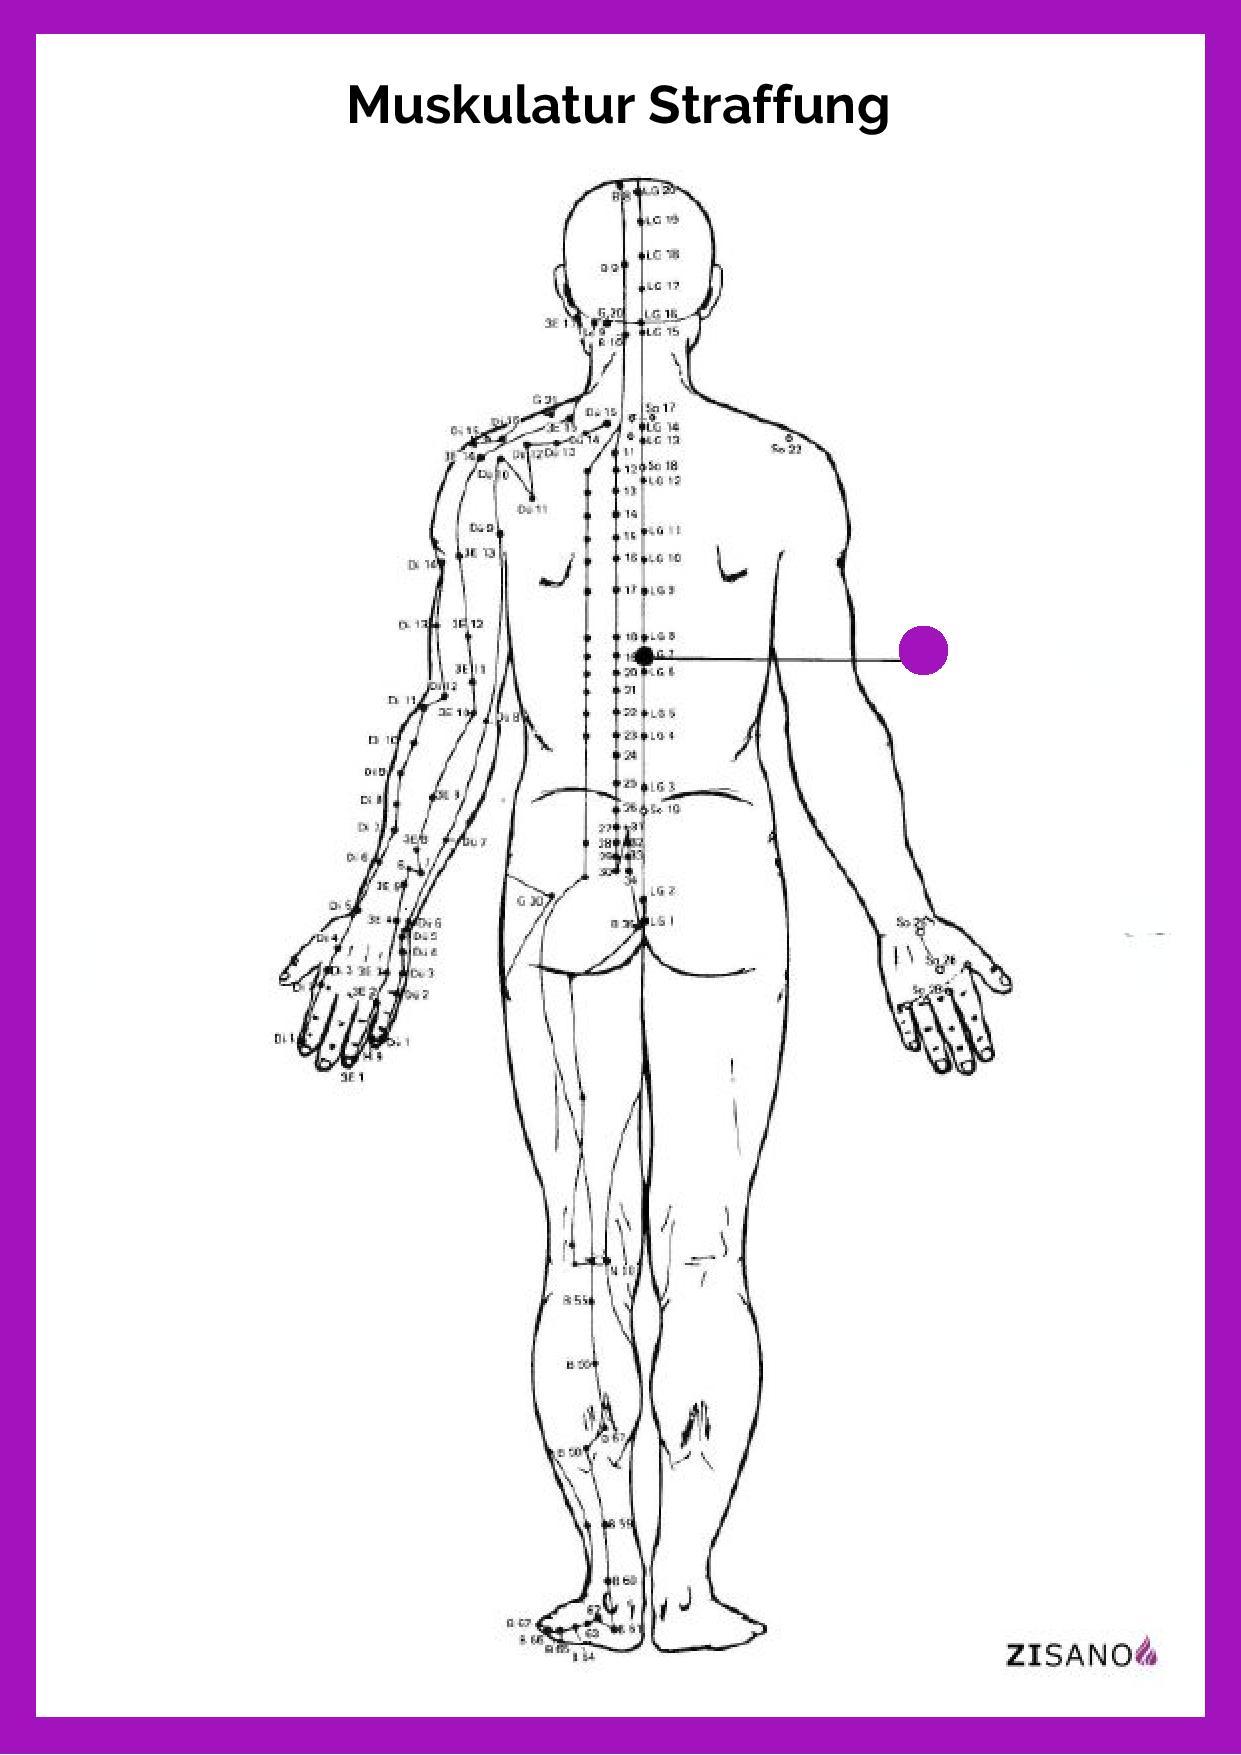 Meridiane - Muskulatur Straffung - Beschwerden